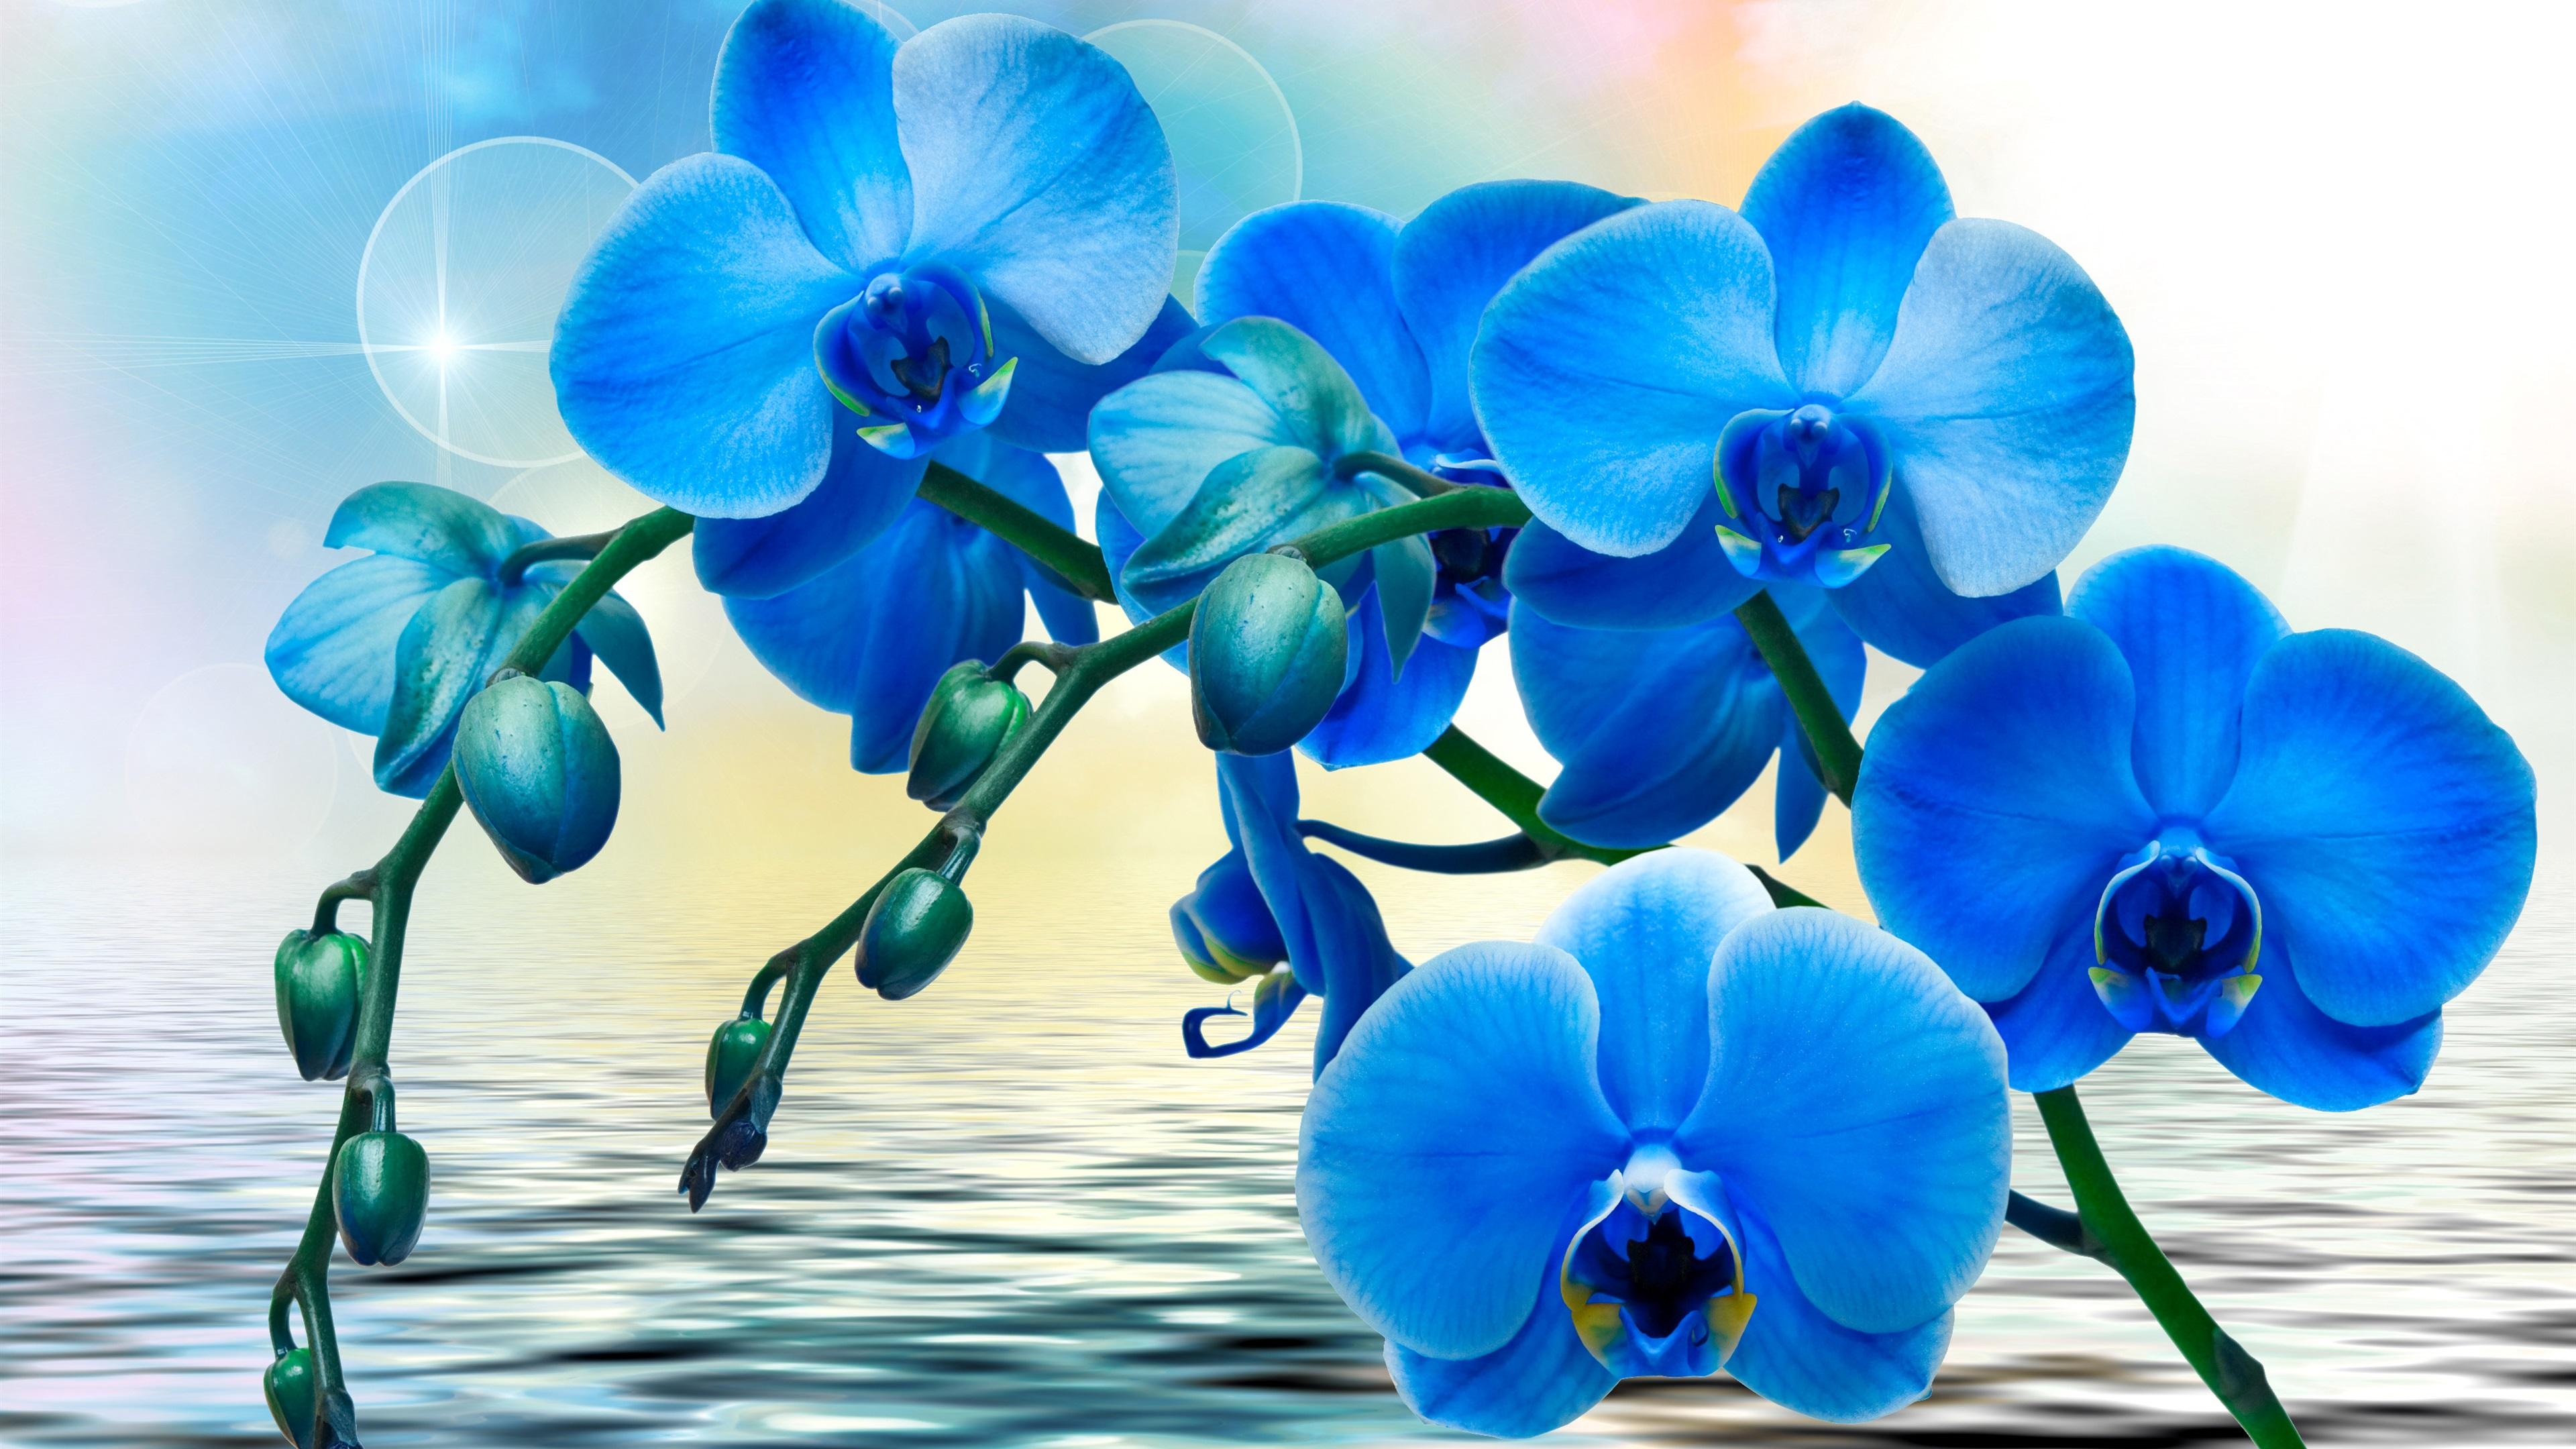 Habrumalas orchids in water wallpaper images - Wallpaper Flowers Water Orchid Photo 17 Orchid Es Fleurs Bleues Phalaenopsis Eau Fonds D Cran